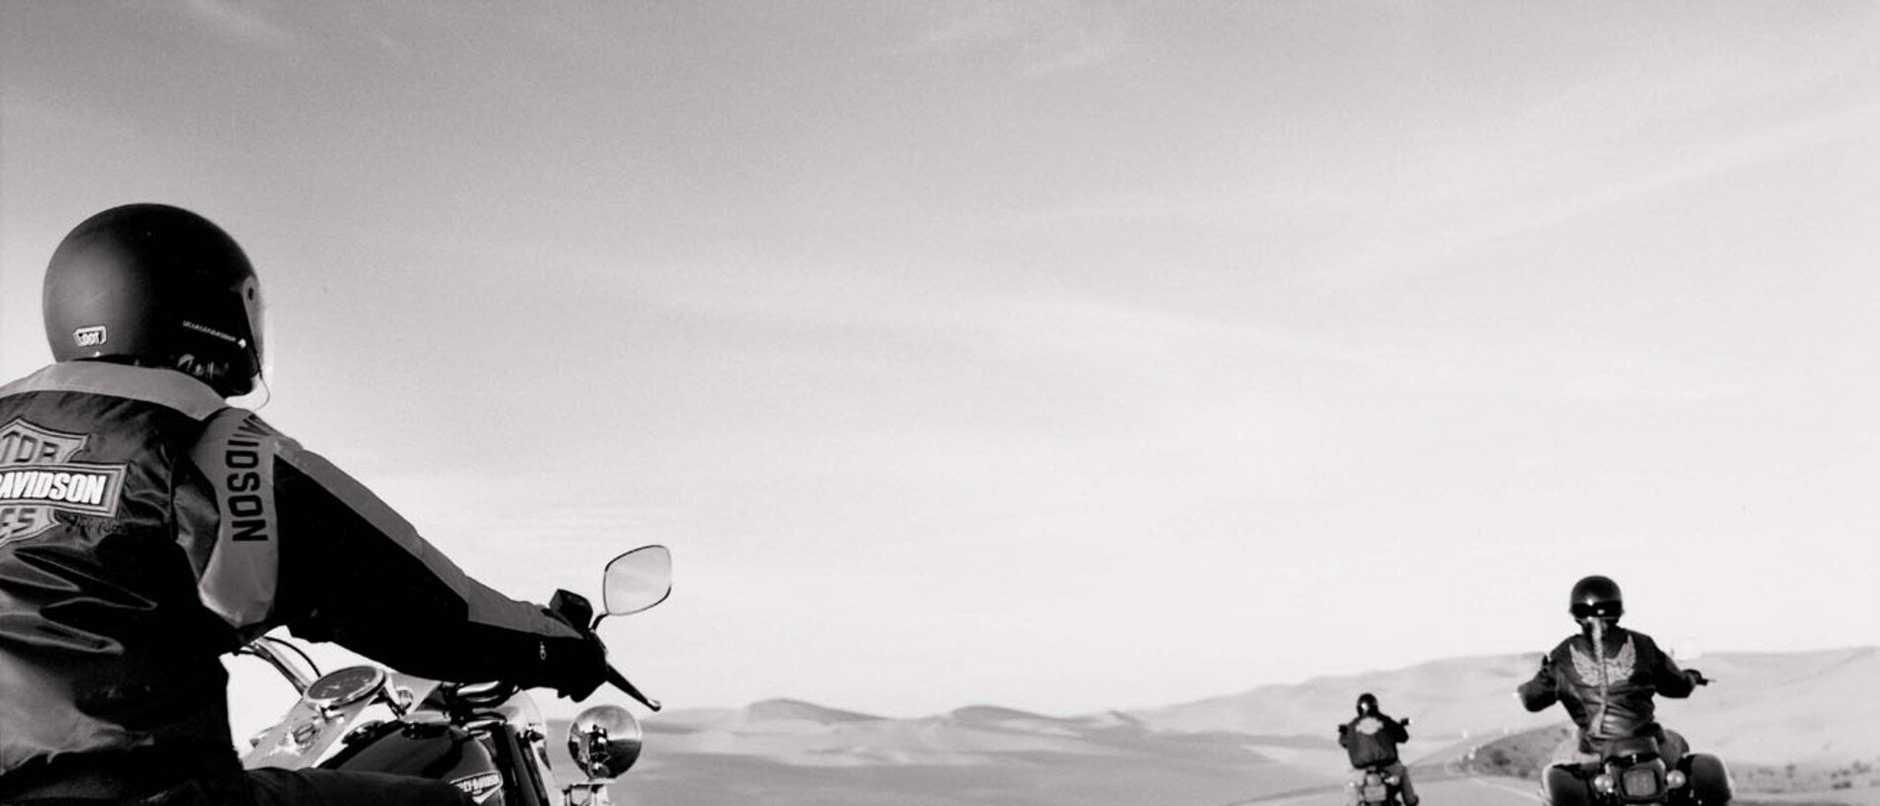 AUGUST, 2003 : Generic photo of men riding Harley Davidson motorcycles down highway, 08/03. Motor Vehicle / Motorcycle / Bike